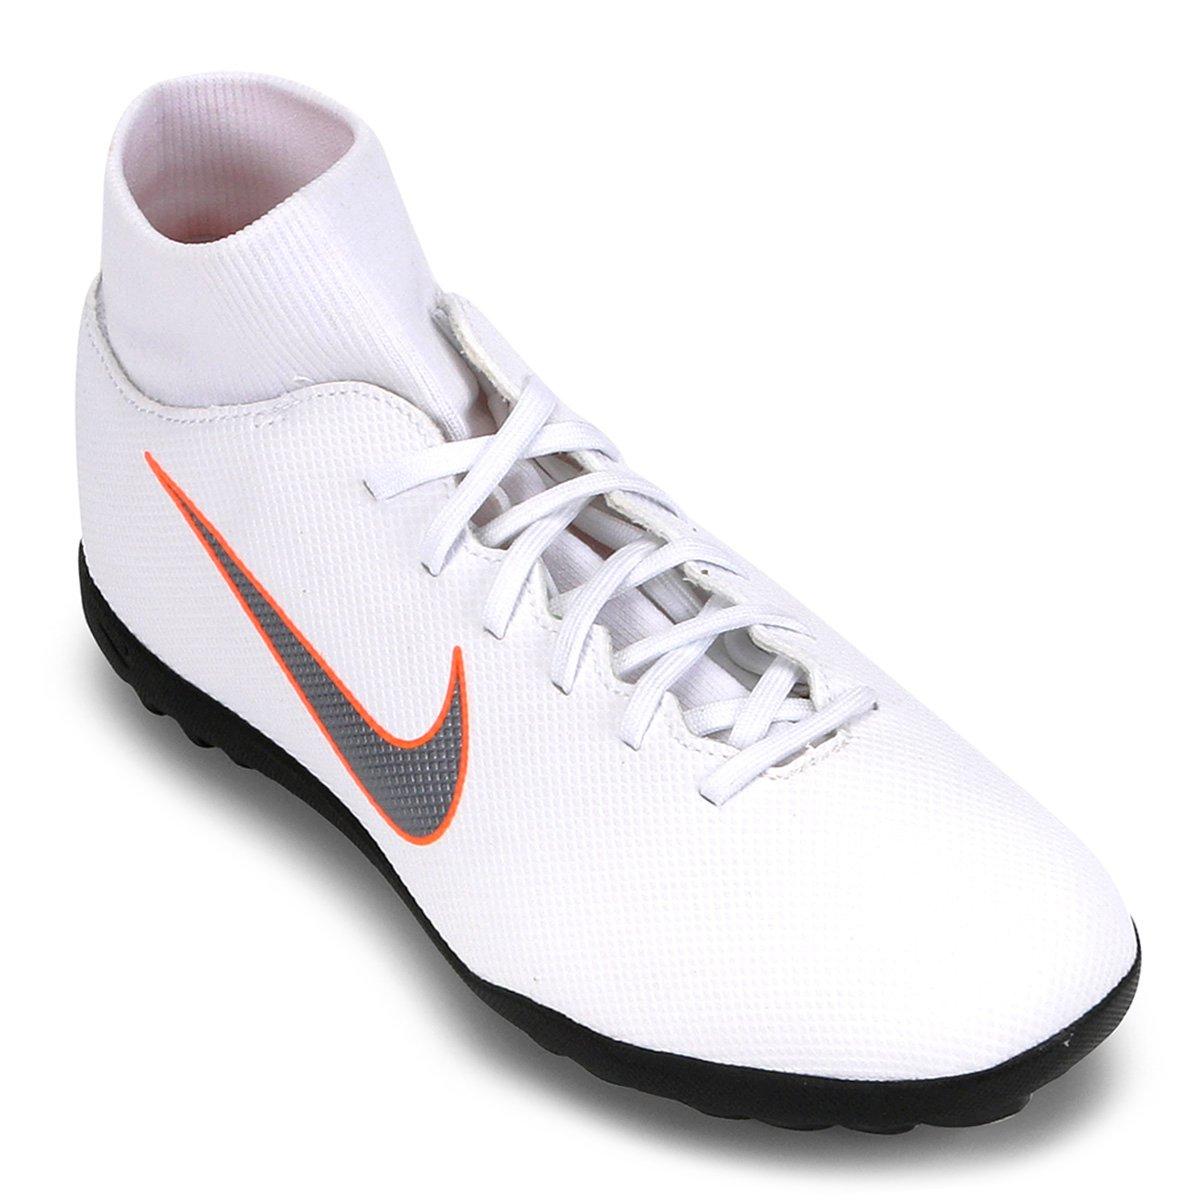 7c38d38582 Chuteira Society Nike Mercurial Superfly 6 Club - Branco e Cinza ...